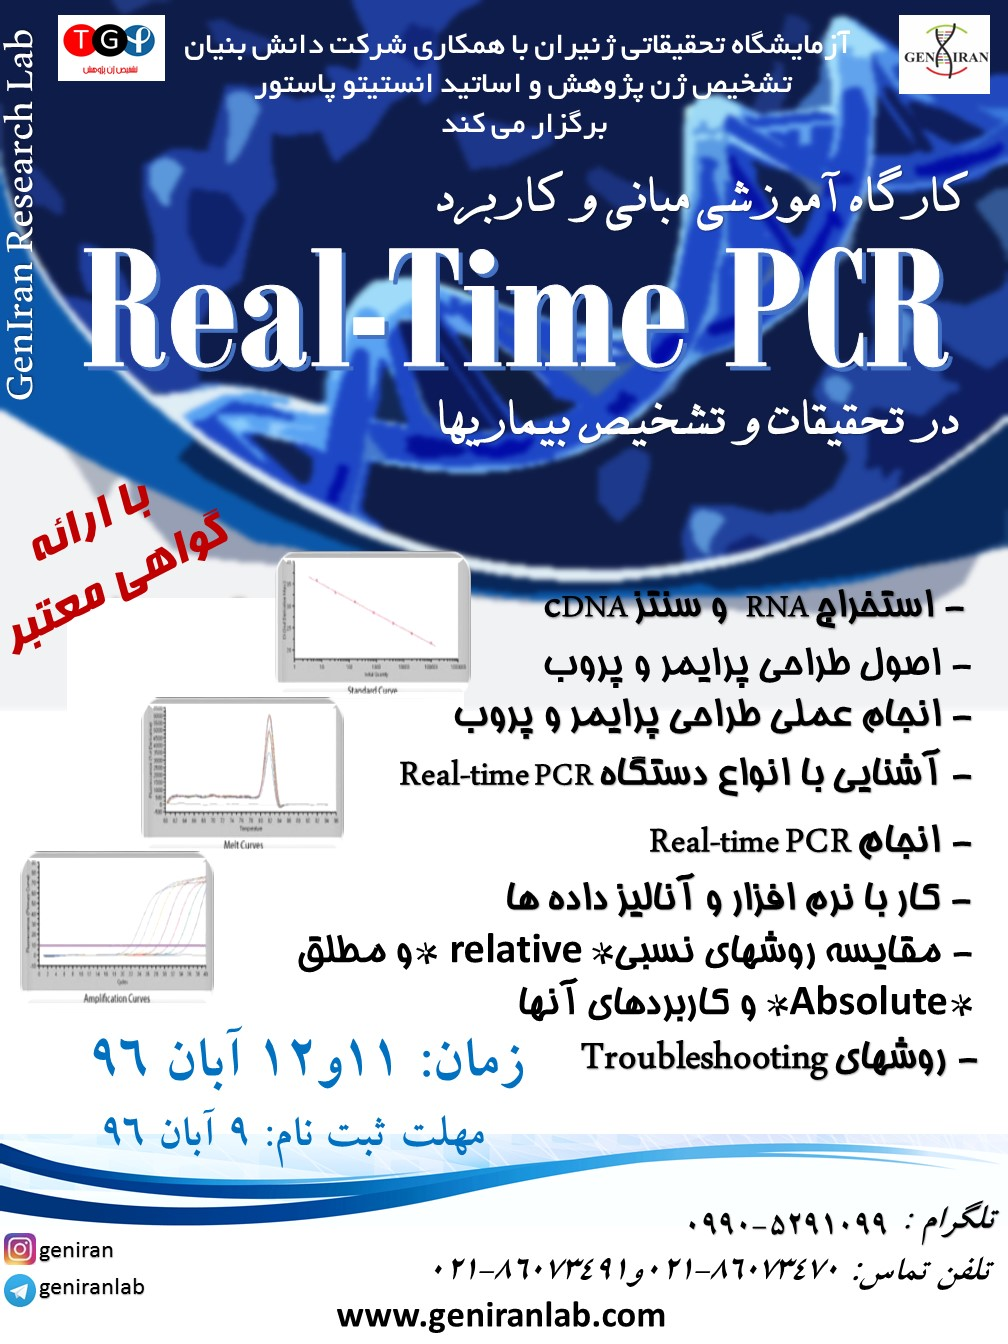 کارگاه Real-Time PCR